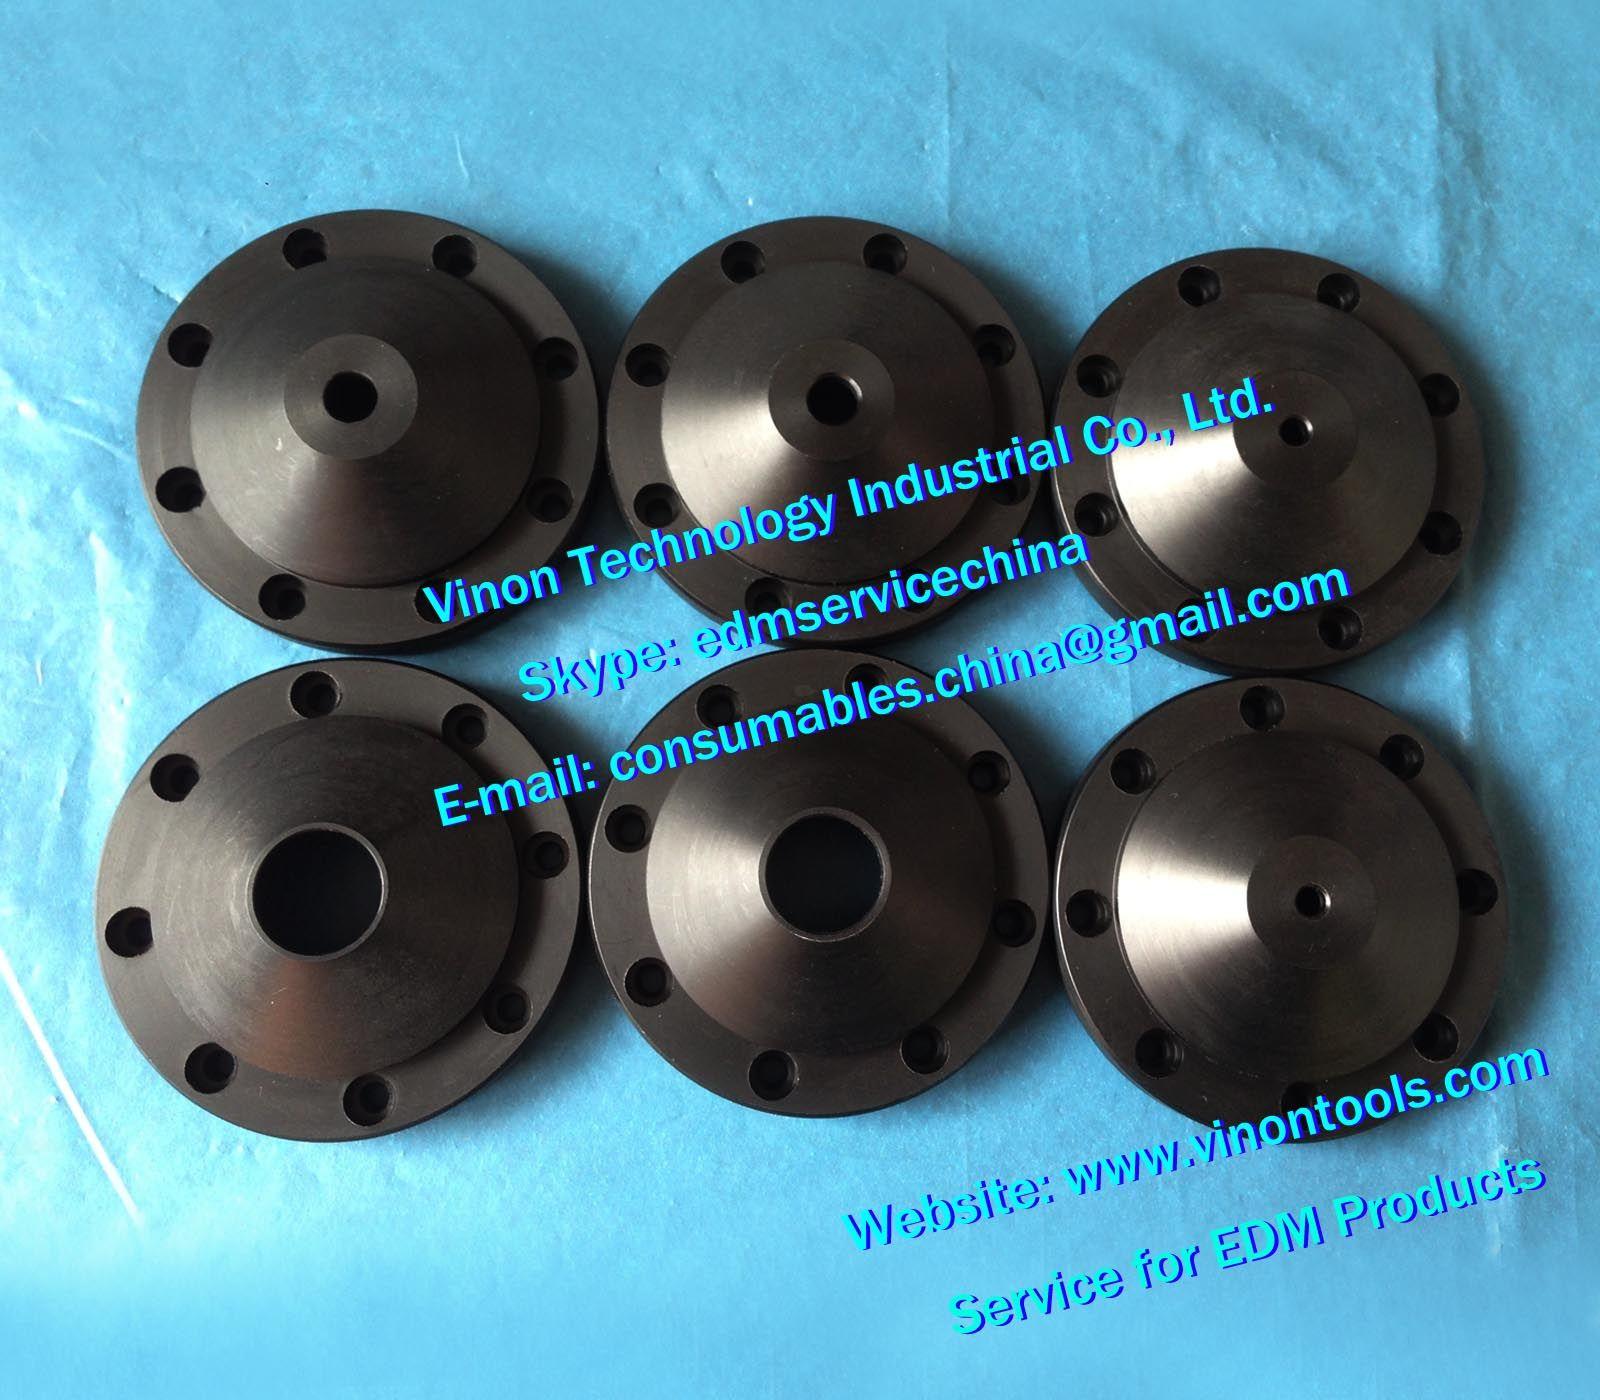 (5pcs) X186C793H01 d=4mm Fluhing Nozzle Upper M215, Flush cup Ø4mm  X186C793H02 for Mitsubishi BA24,BA8,FA,FX,PA (can mix dia  4/7/8/12/15mm)